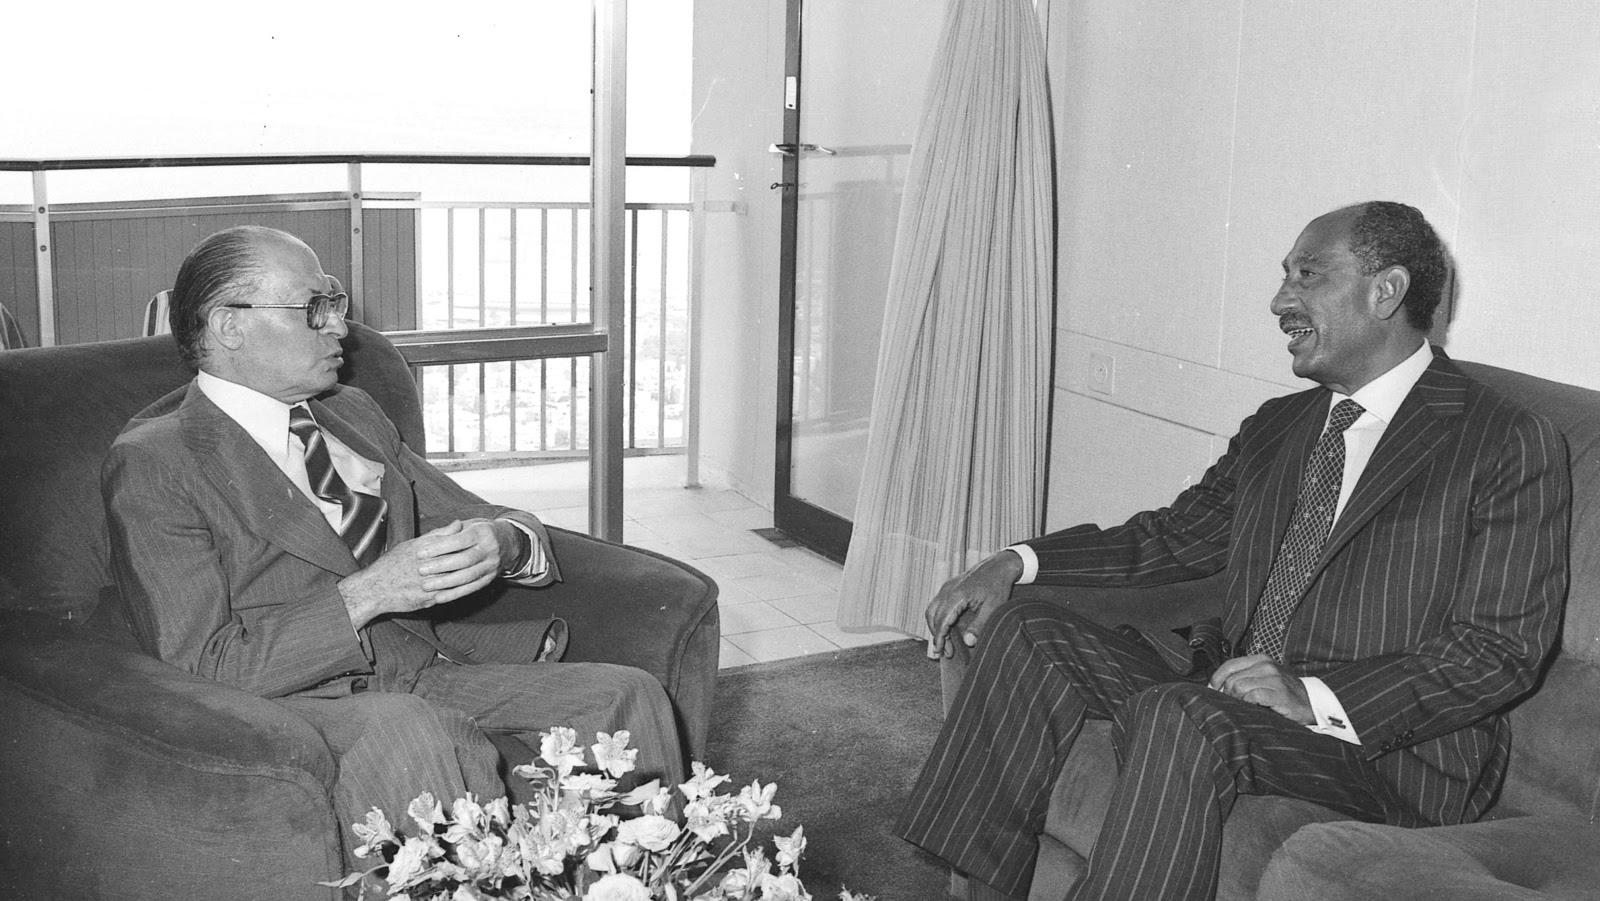 Haifa_Sep_1979_-_From_the_Dan_Hadani_Archive_National_Library_of_Israel_Photo_Credit_-_Dan_Hadani_11483-019-08.jpg